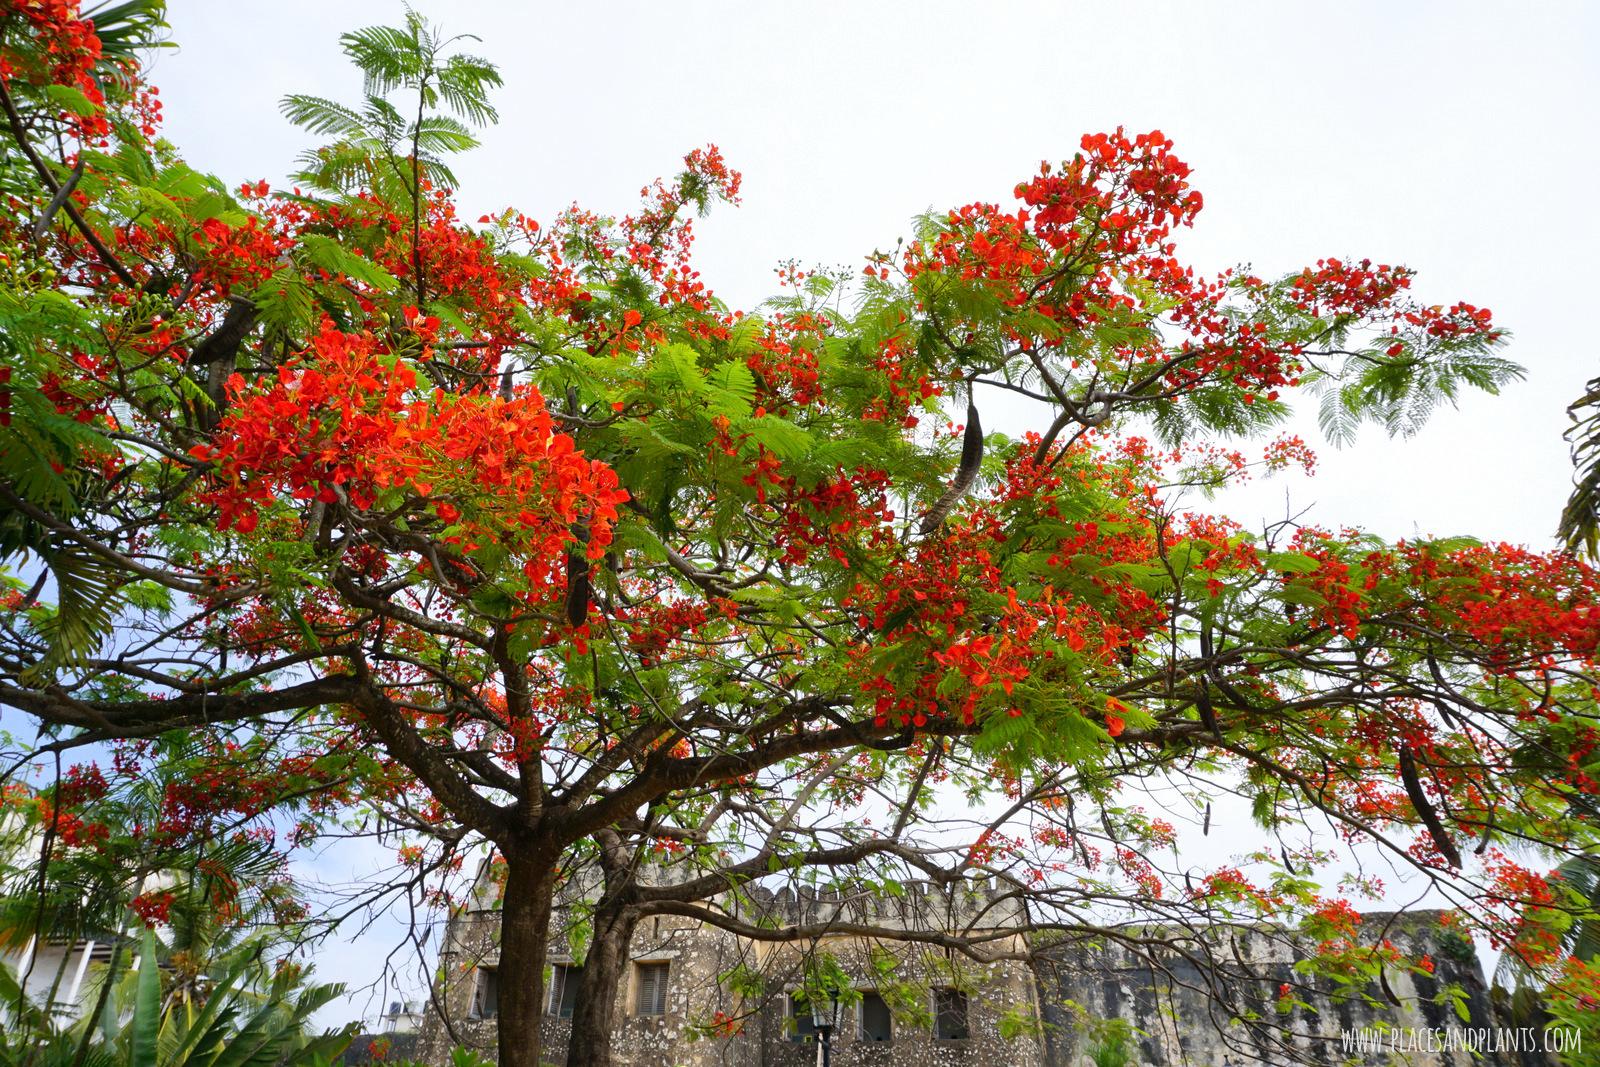 Zanzibar stone Town Ogrody Forodhani Gardens